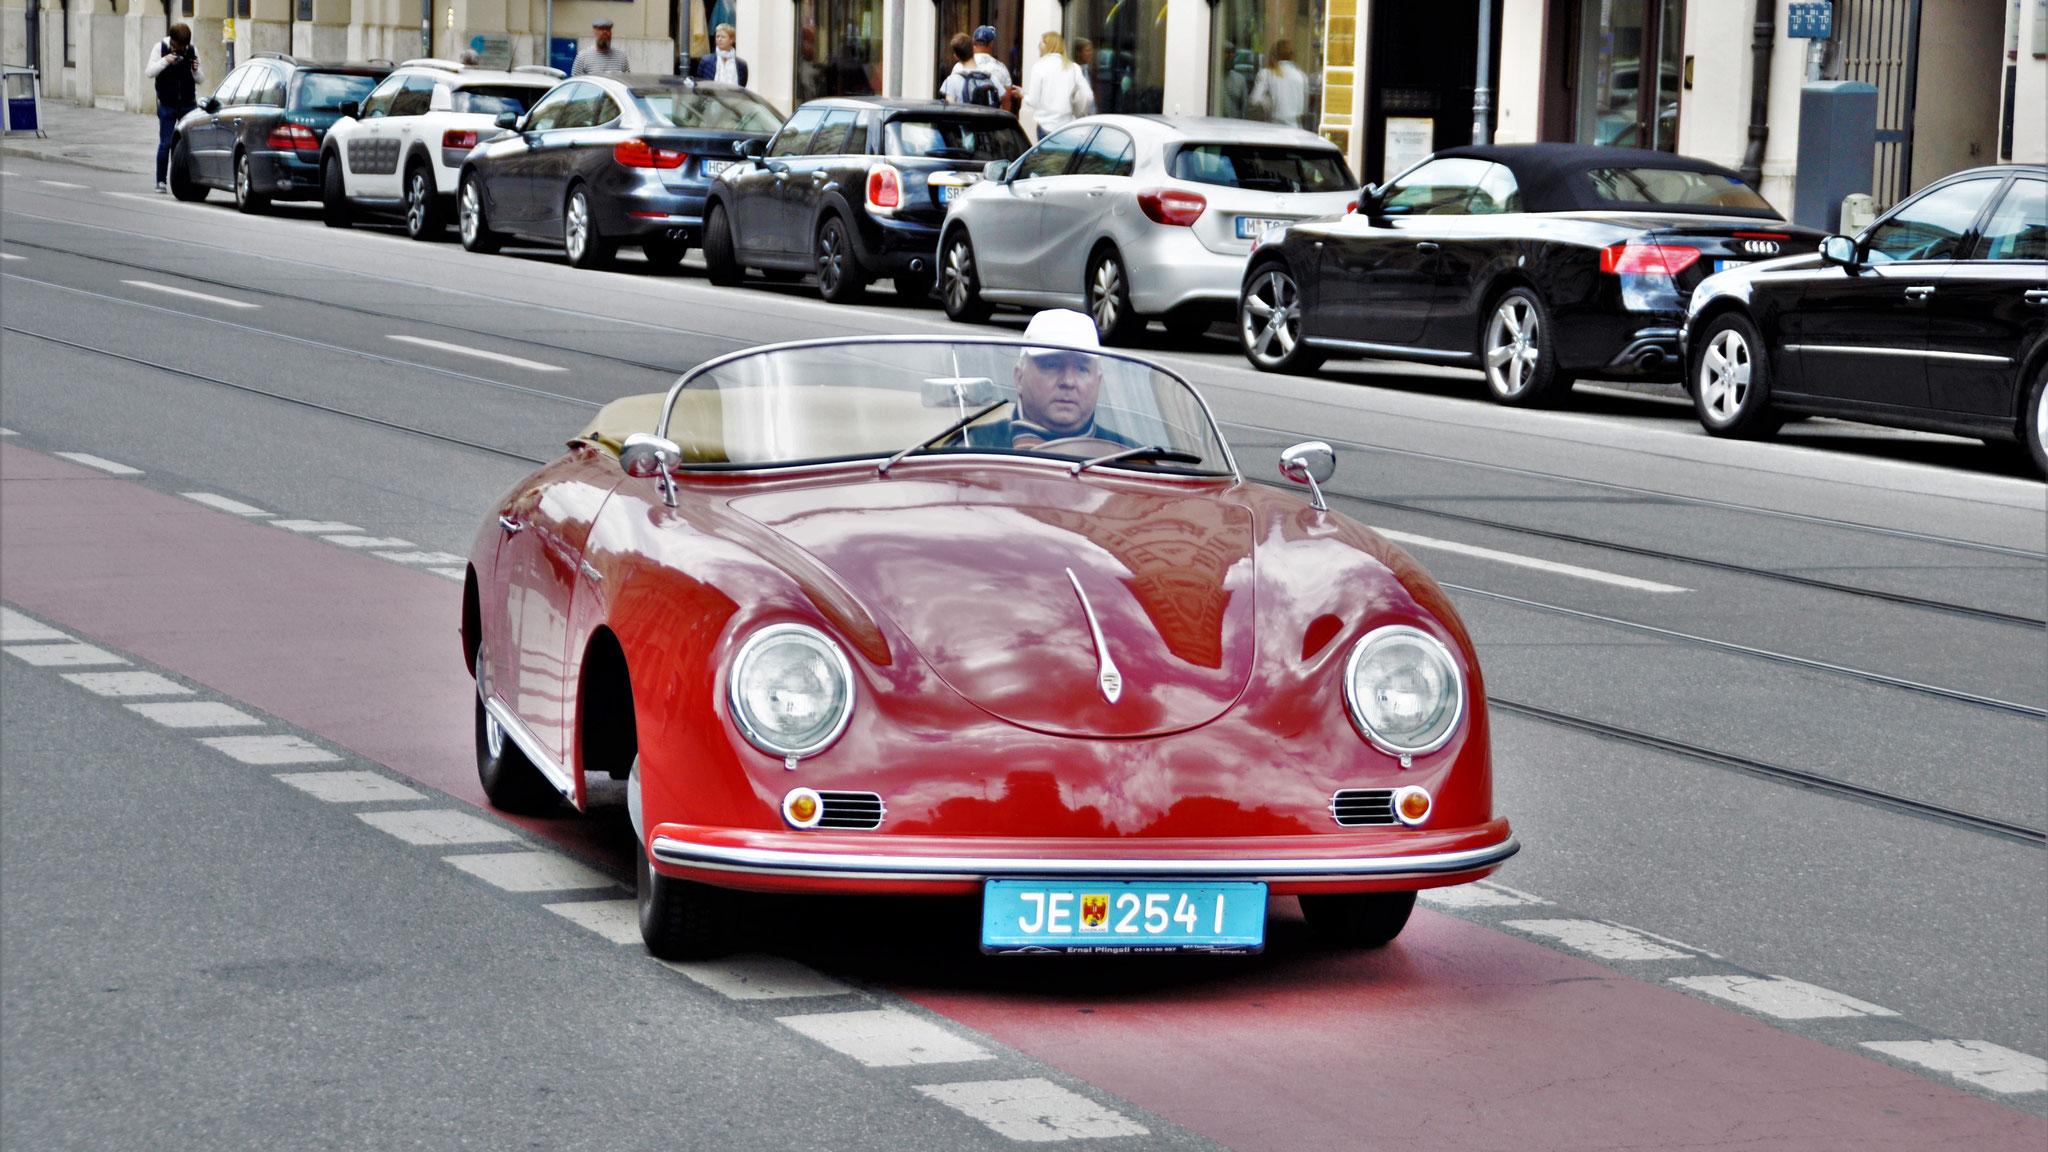 Porsche 356 1500 Speedster - JE-254-I (AUT)